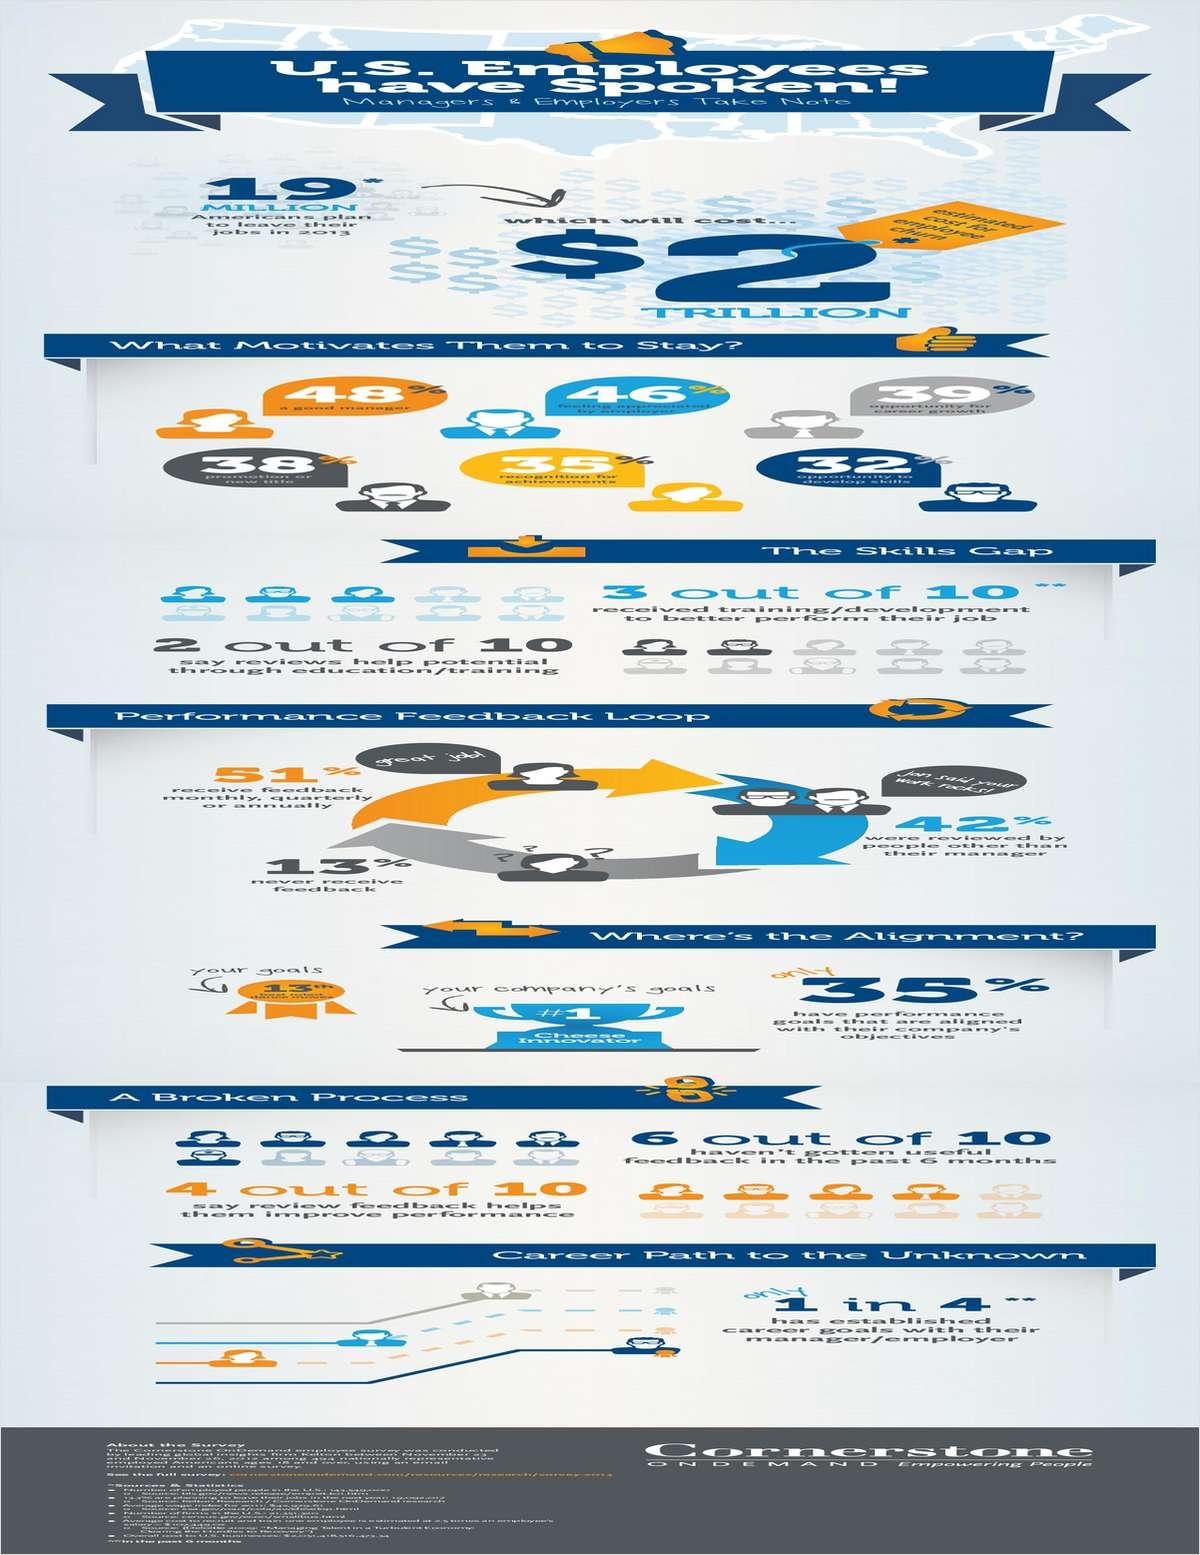 The Cornerstone OnDemand 2013 U.S. Employee Report